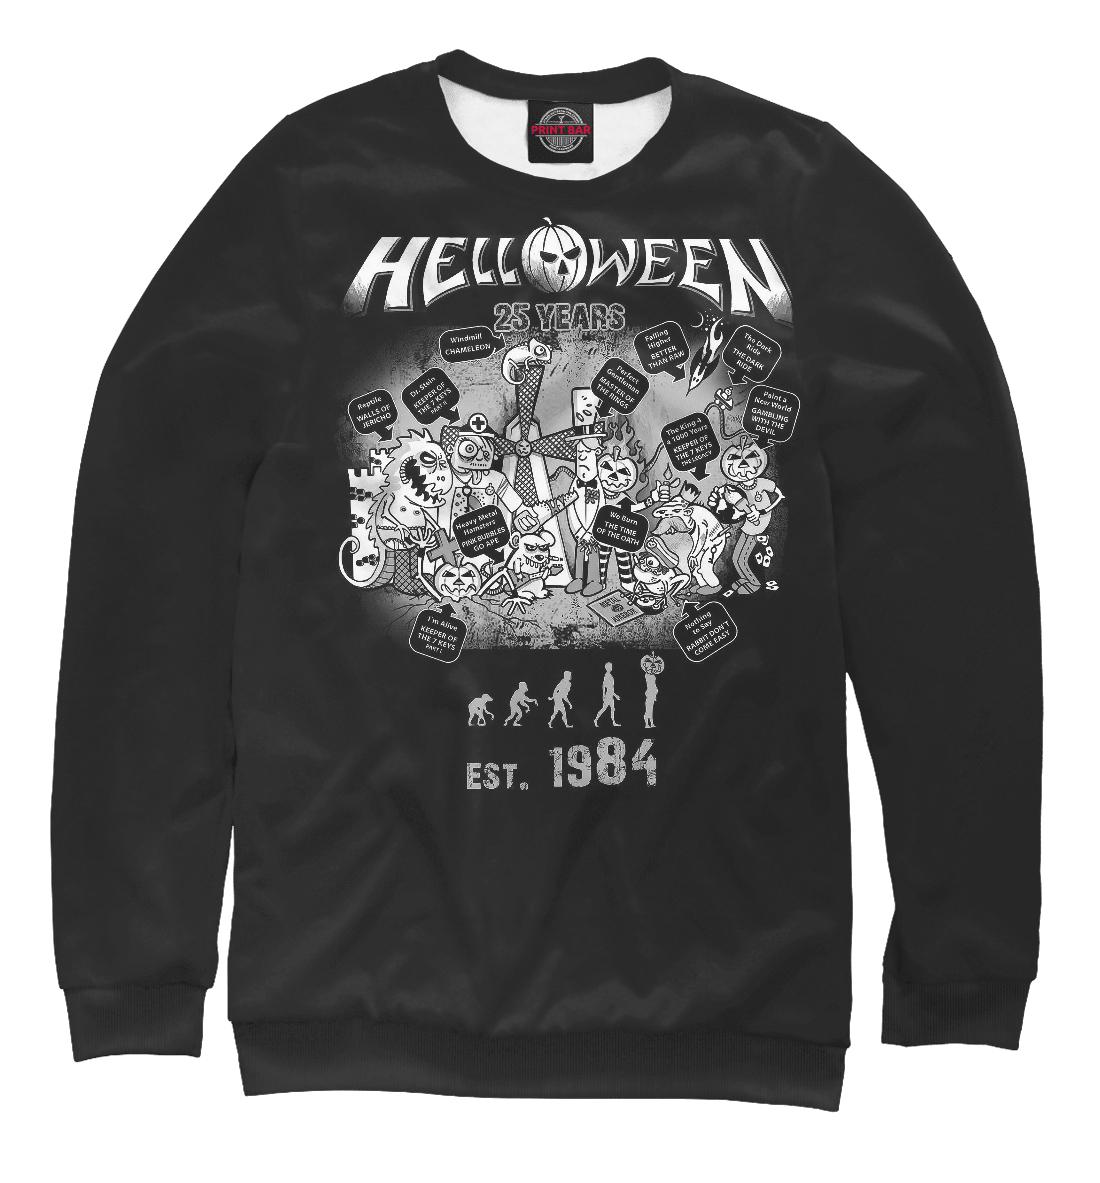 Купить Helloween, Printbar, Свитшоты, MZK-967228-swi-1